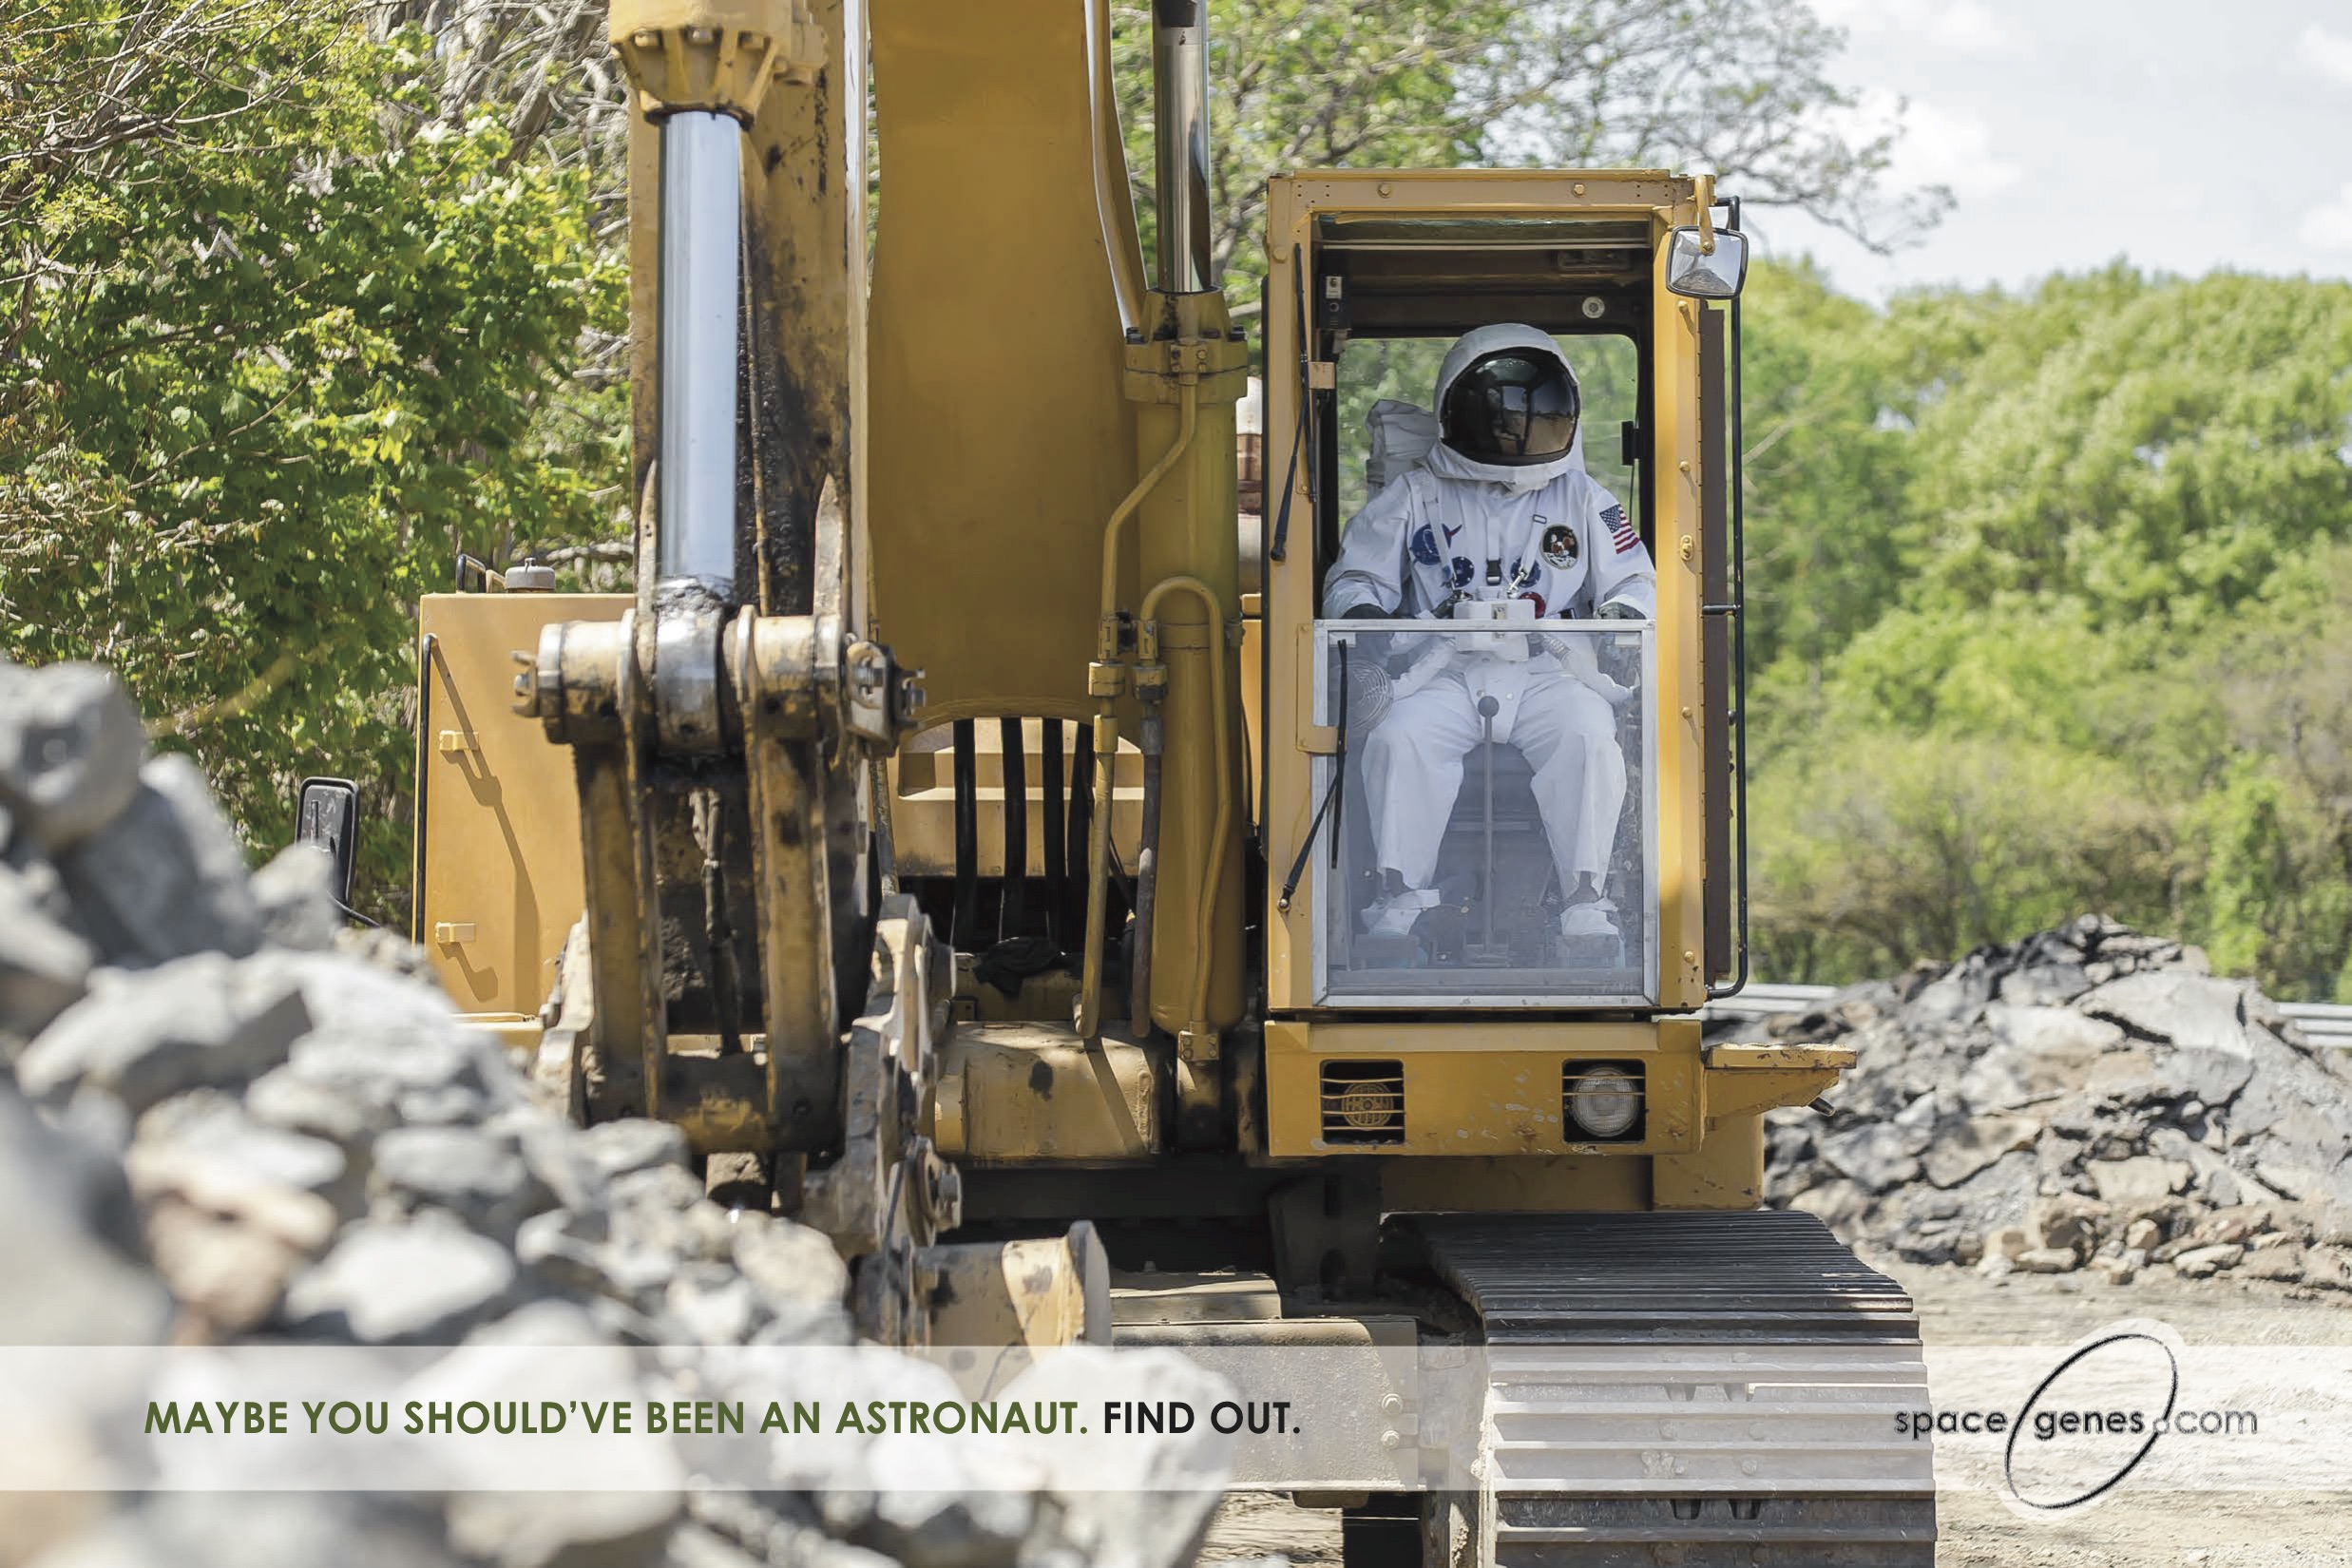 Construction worker dressed as astronaut in Veritas Genetics ad